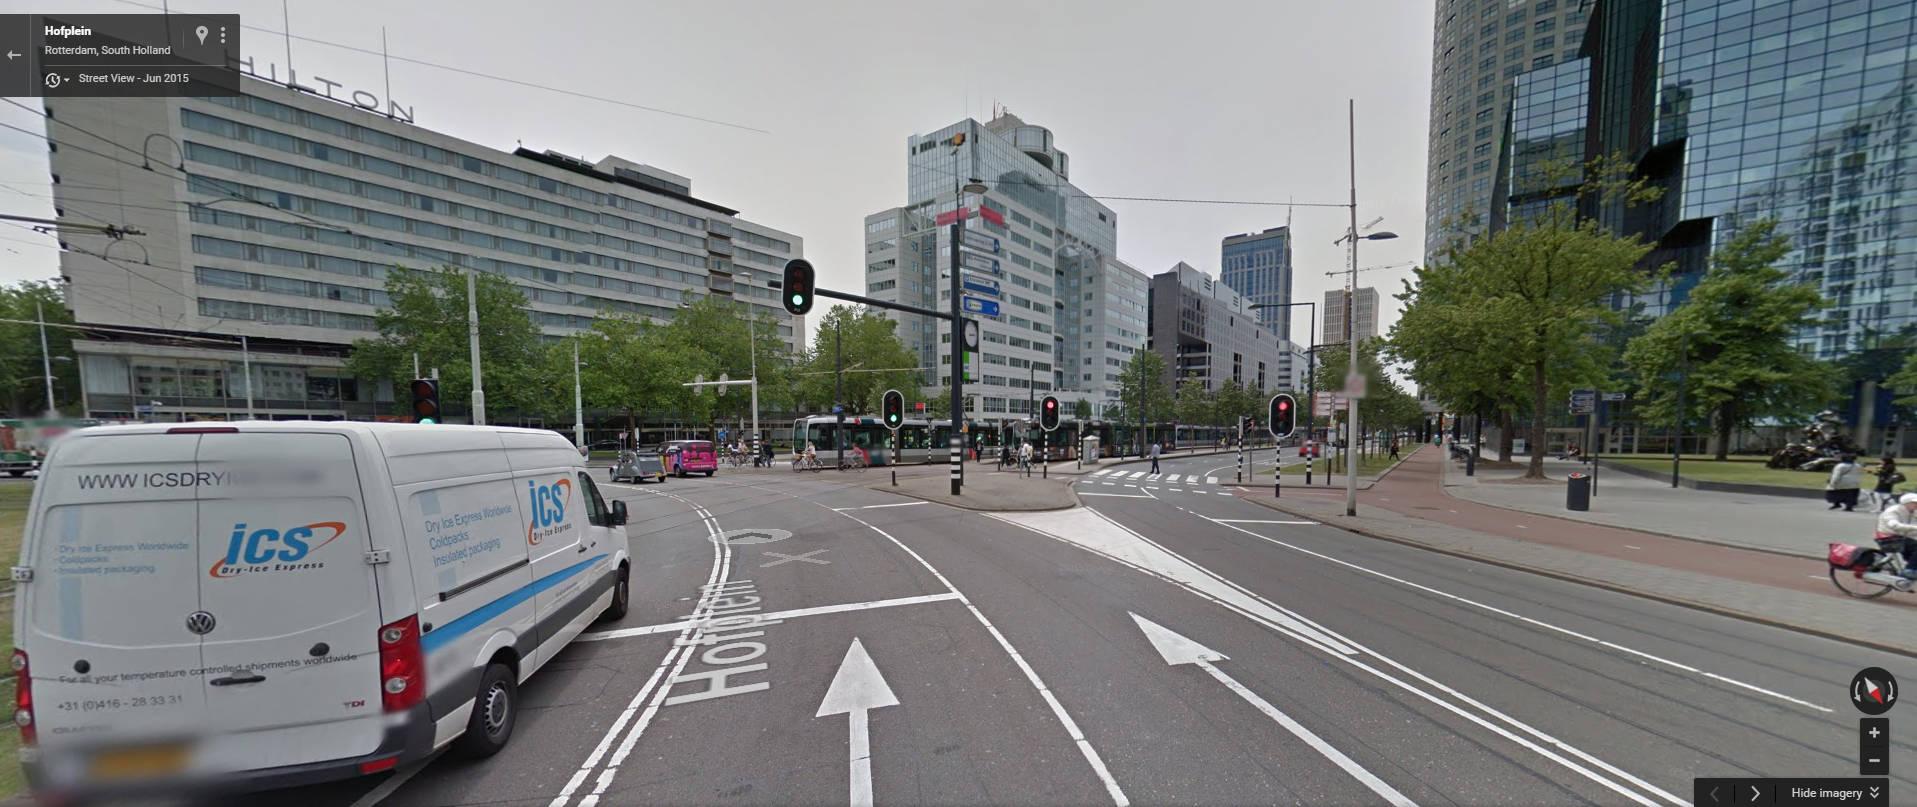 Hofplein - Rotterdam